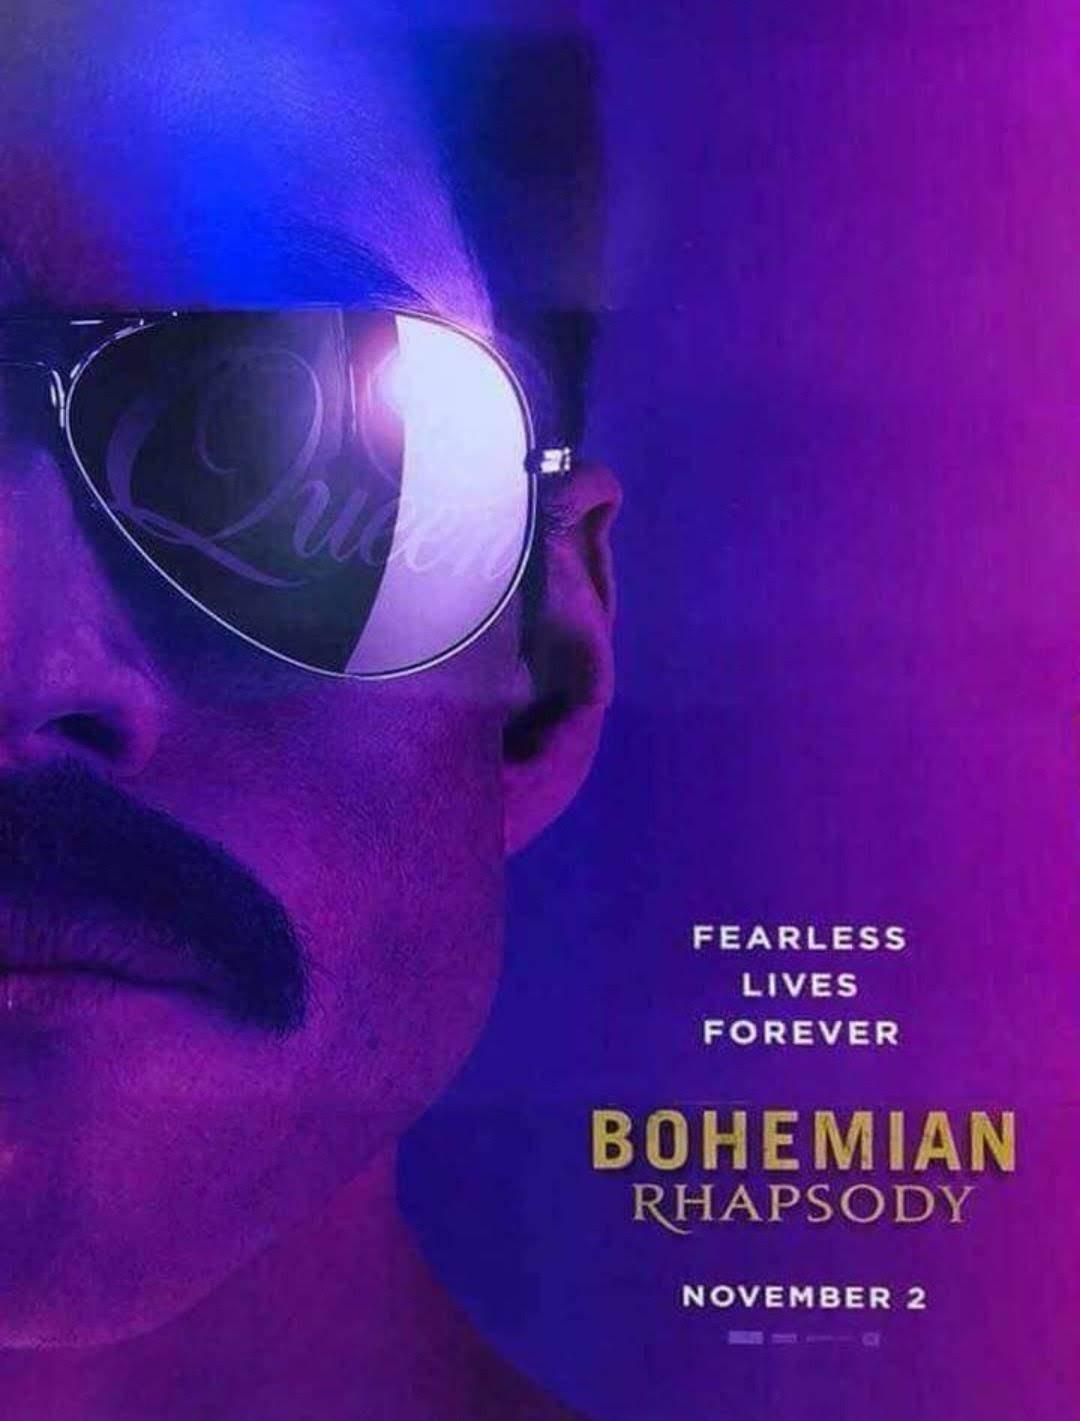 Bohemian Rhapsody official site